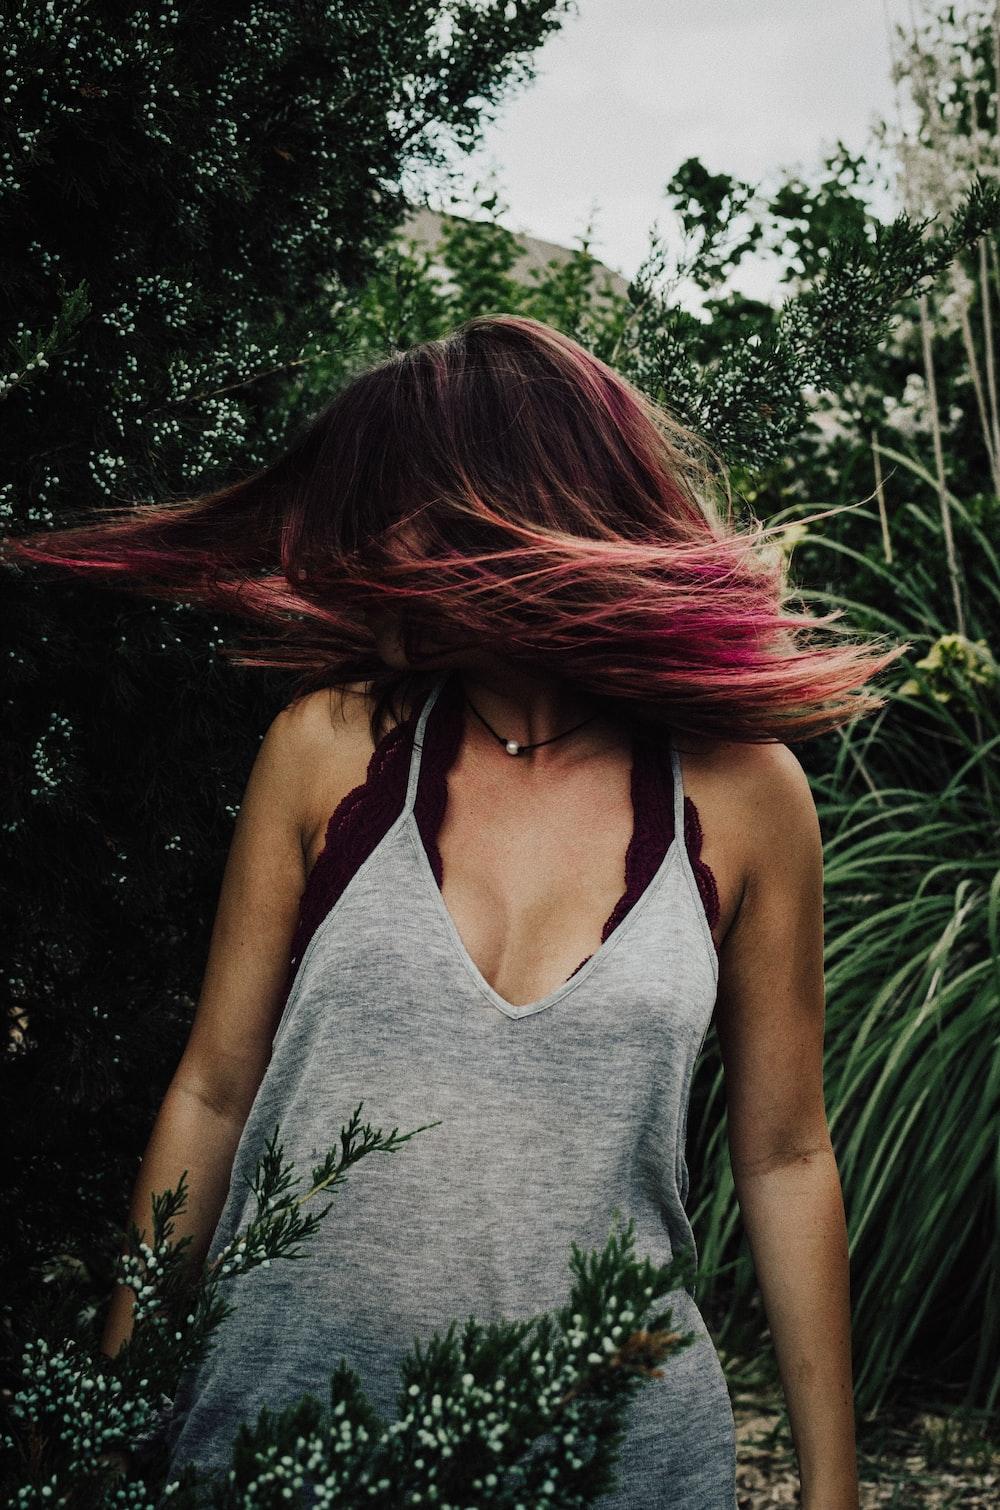 JESSICA CASTRO - Jessica Castro (jessica978) on Myspace